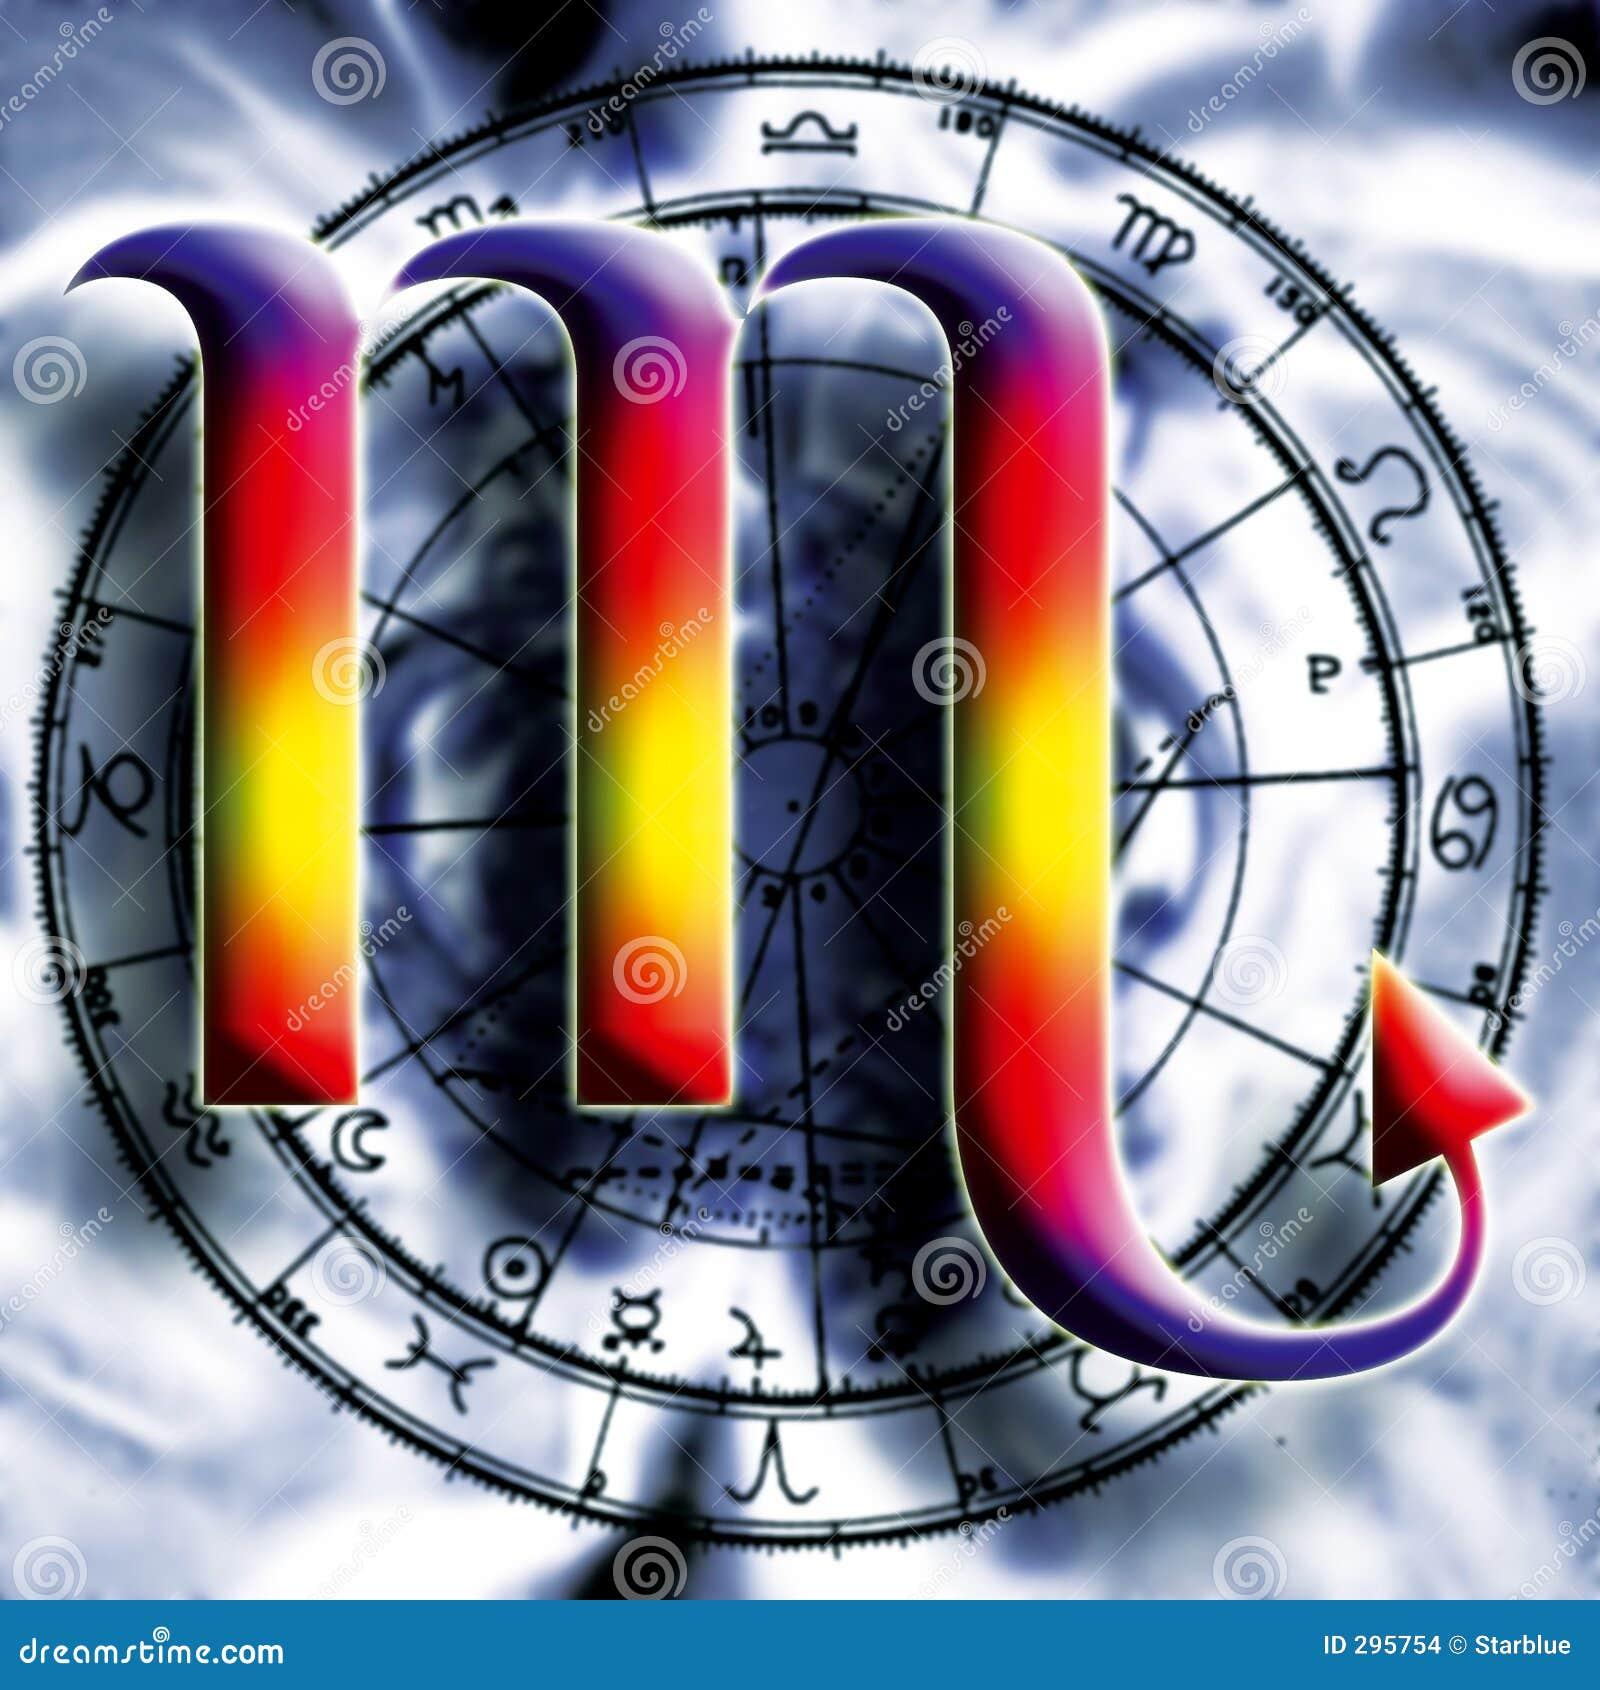 Astrological sign scorpio